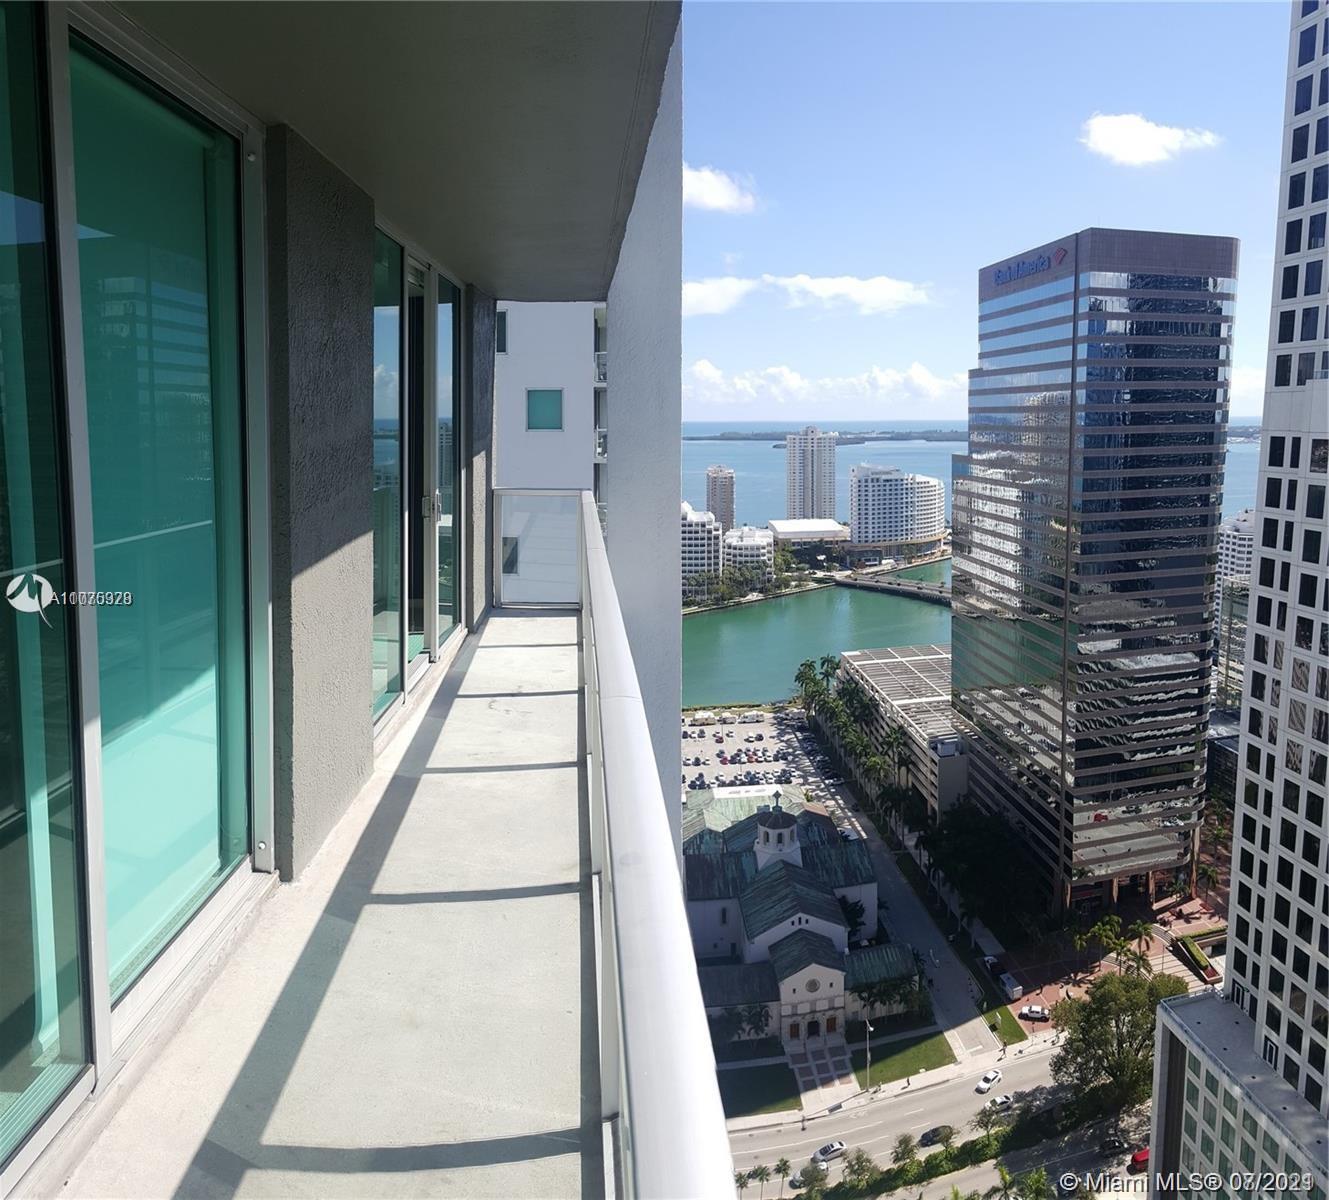 500 Brickell East Tower #3610 - 55 SE 6th St #3610, Miami, FL 33131